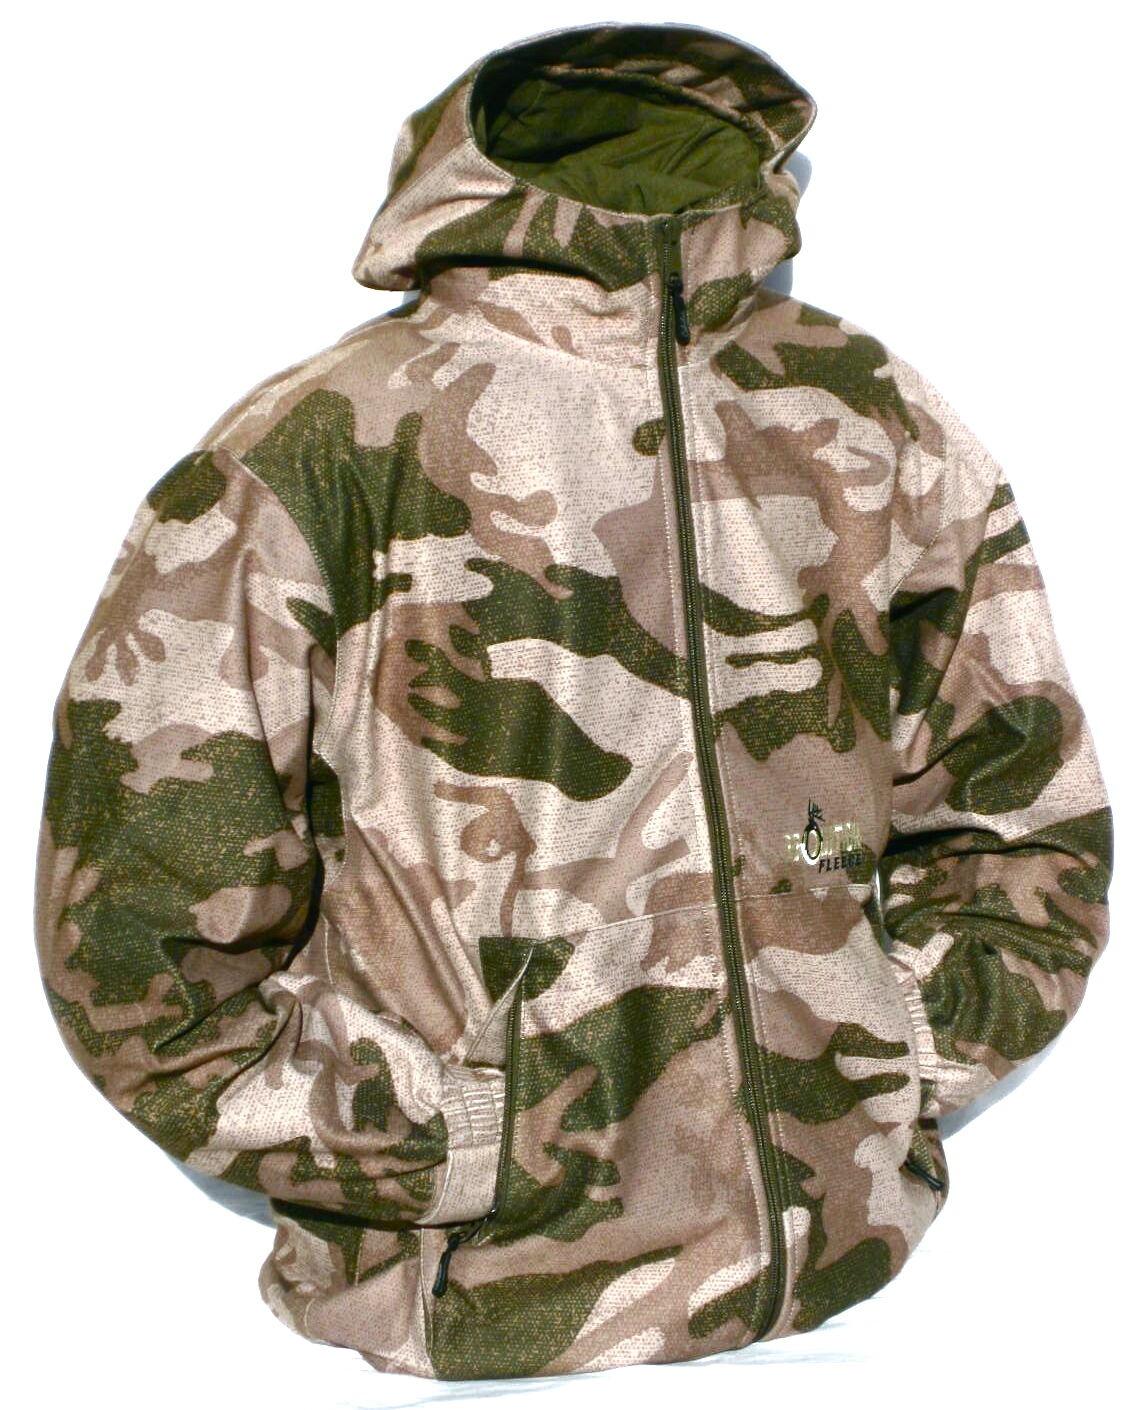 Cabela's Revolution Fleece Dry-plus Wind & Waterproof Outfitter Hunting Jacket